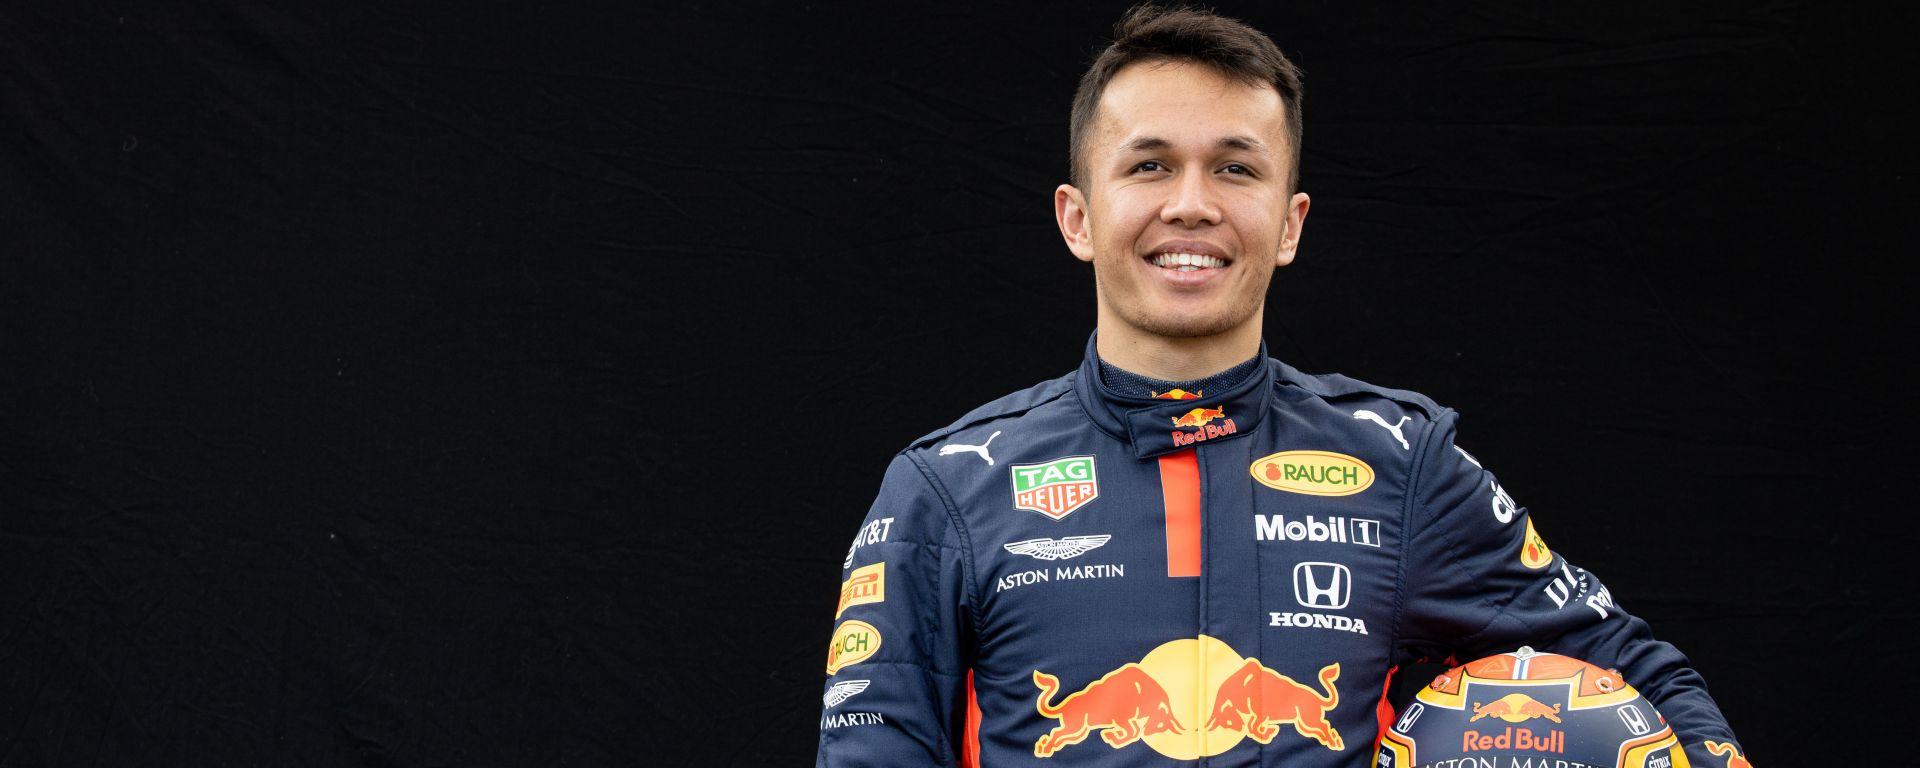 F1 GP Australia 2020, Melbourne: Alexander Albon (Red Bull)